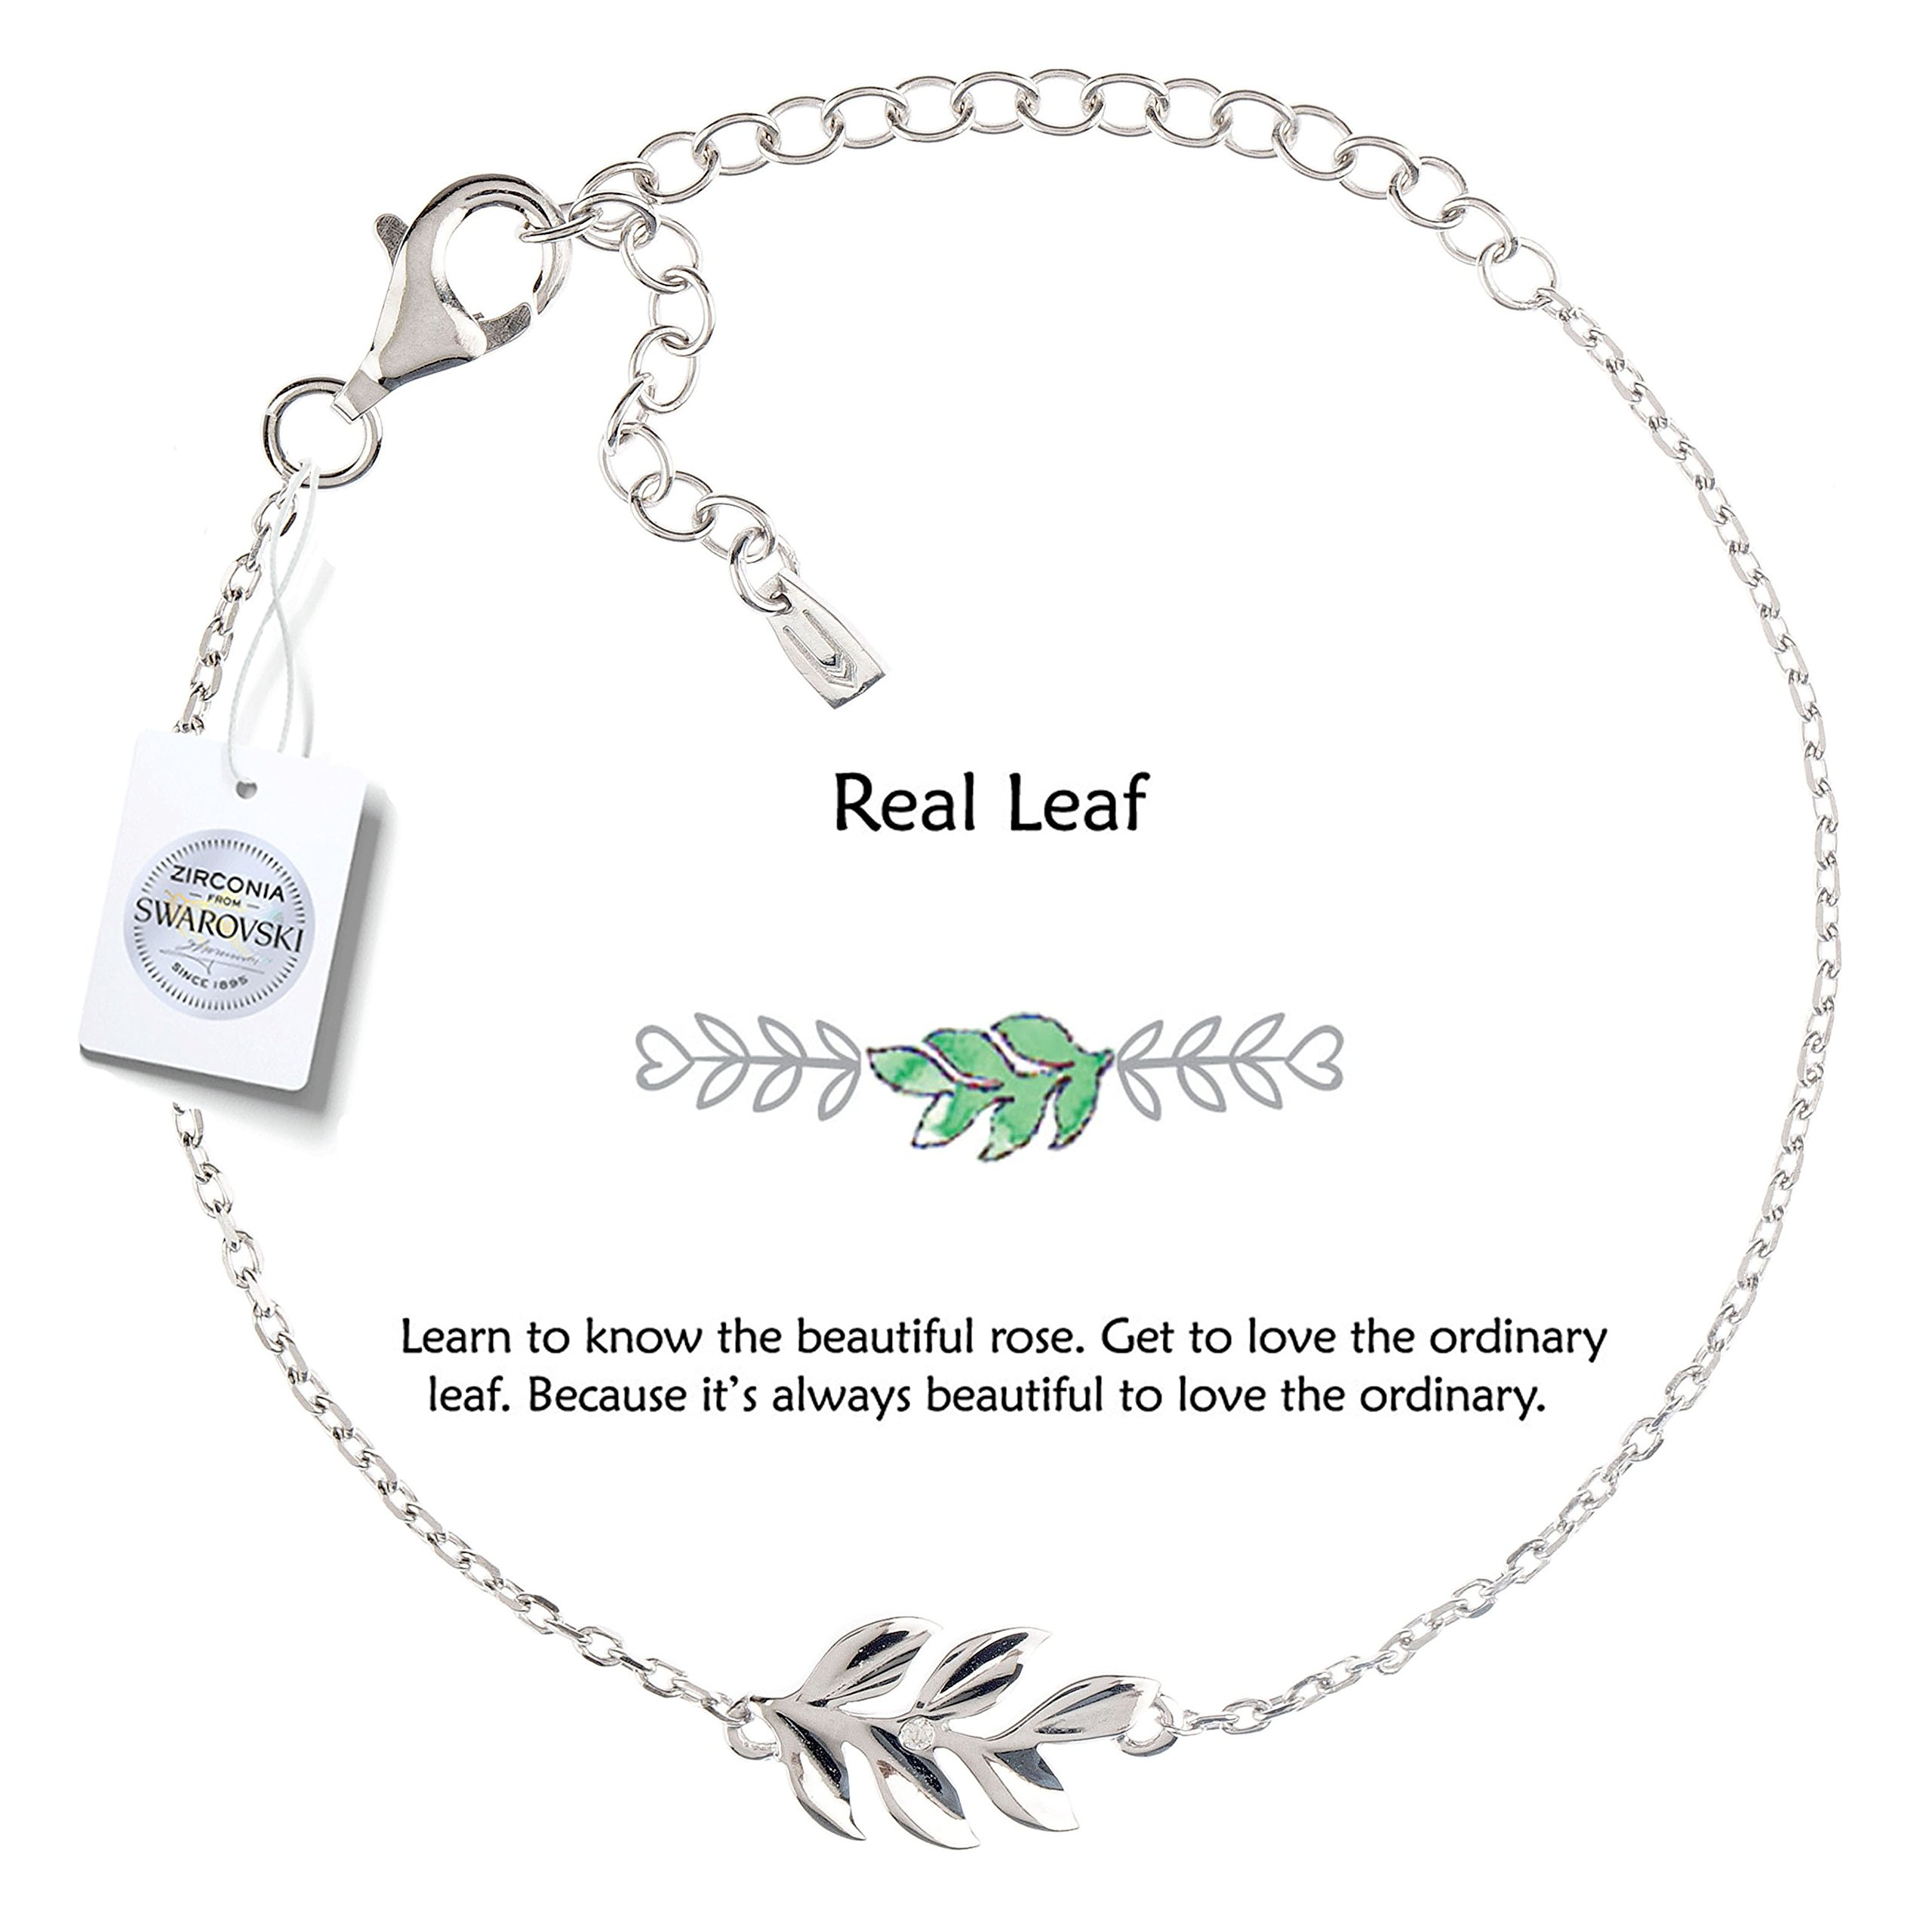 Vivid&Keith Women's Bracelet 925 Sterling Silver Jewelry Rhodium Plated Adjustable With Swarovski Zirconia Leaf Charm Bracelet